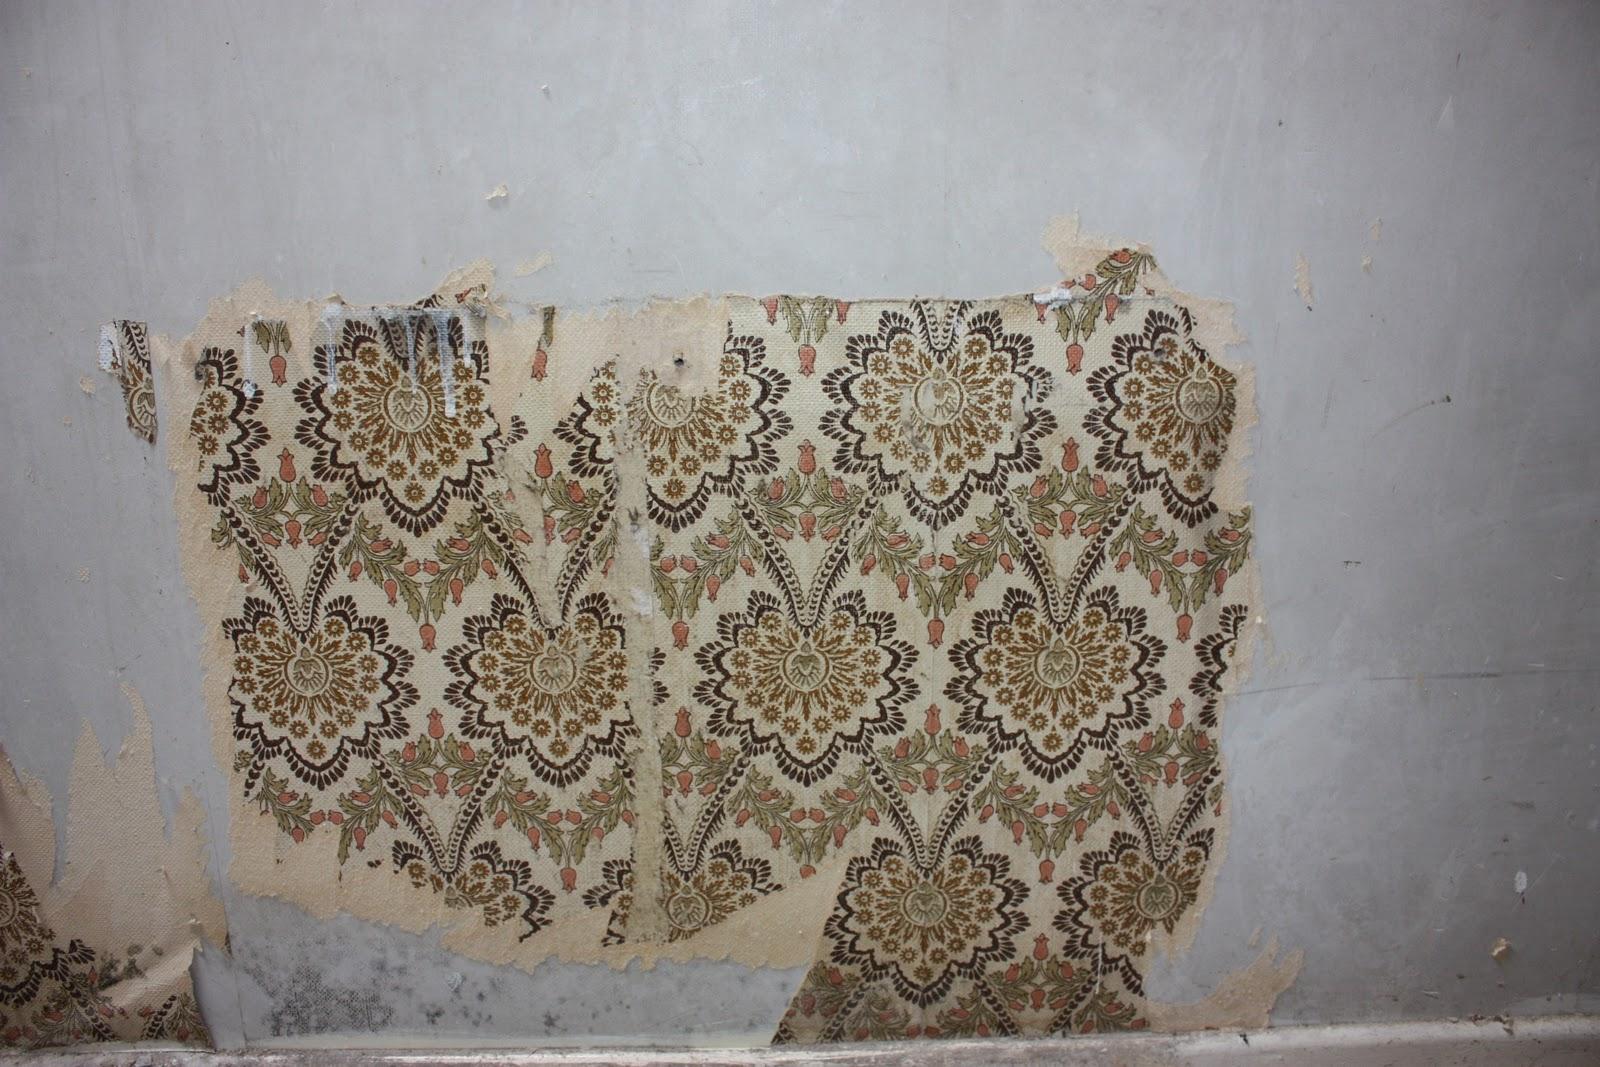 peeling wallpaper photo room ugly decor wallpaper peeling off 1600x1067